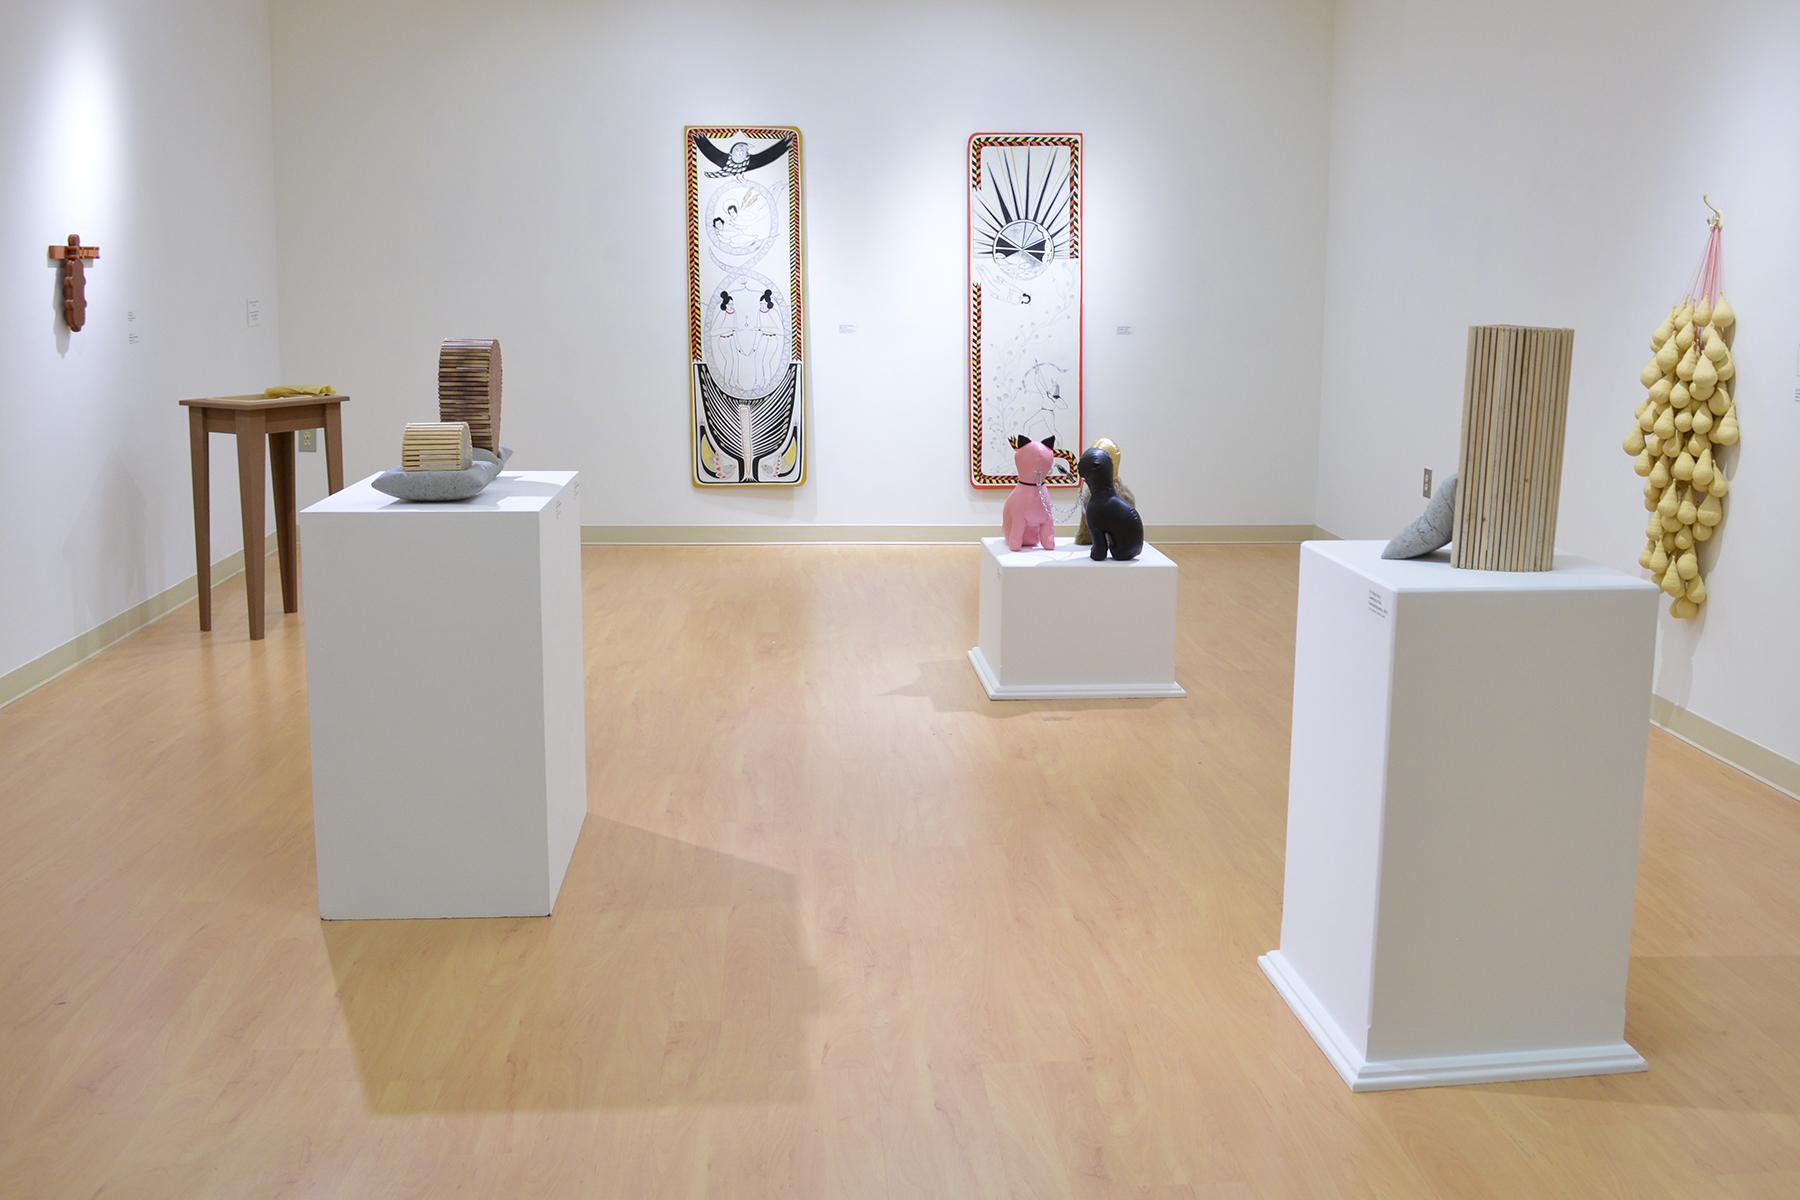 Grit: Arrowmont Artists-in-Residence , Bob Owens Gallery, University of North Georgia, Dahlonega, Ga. 2017